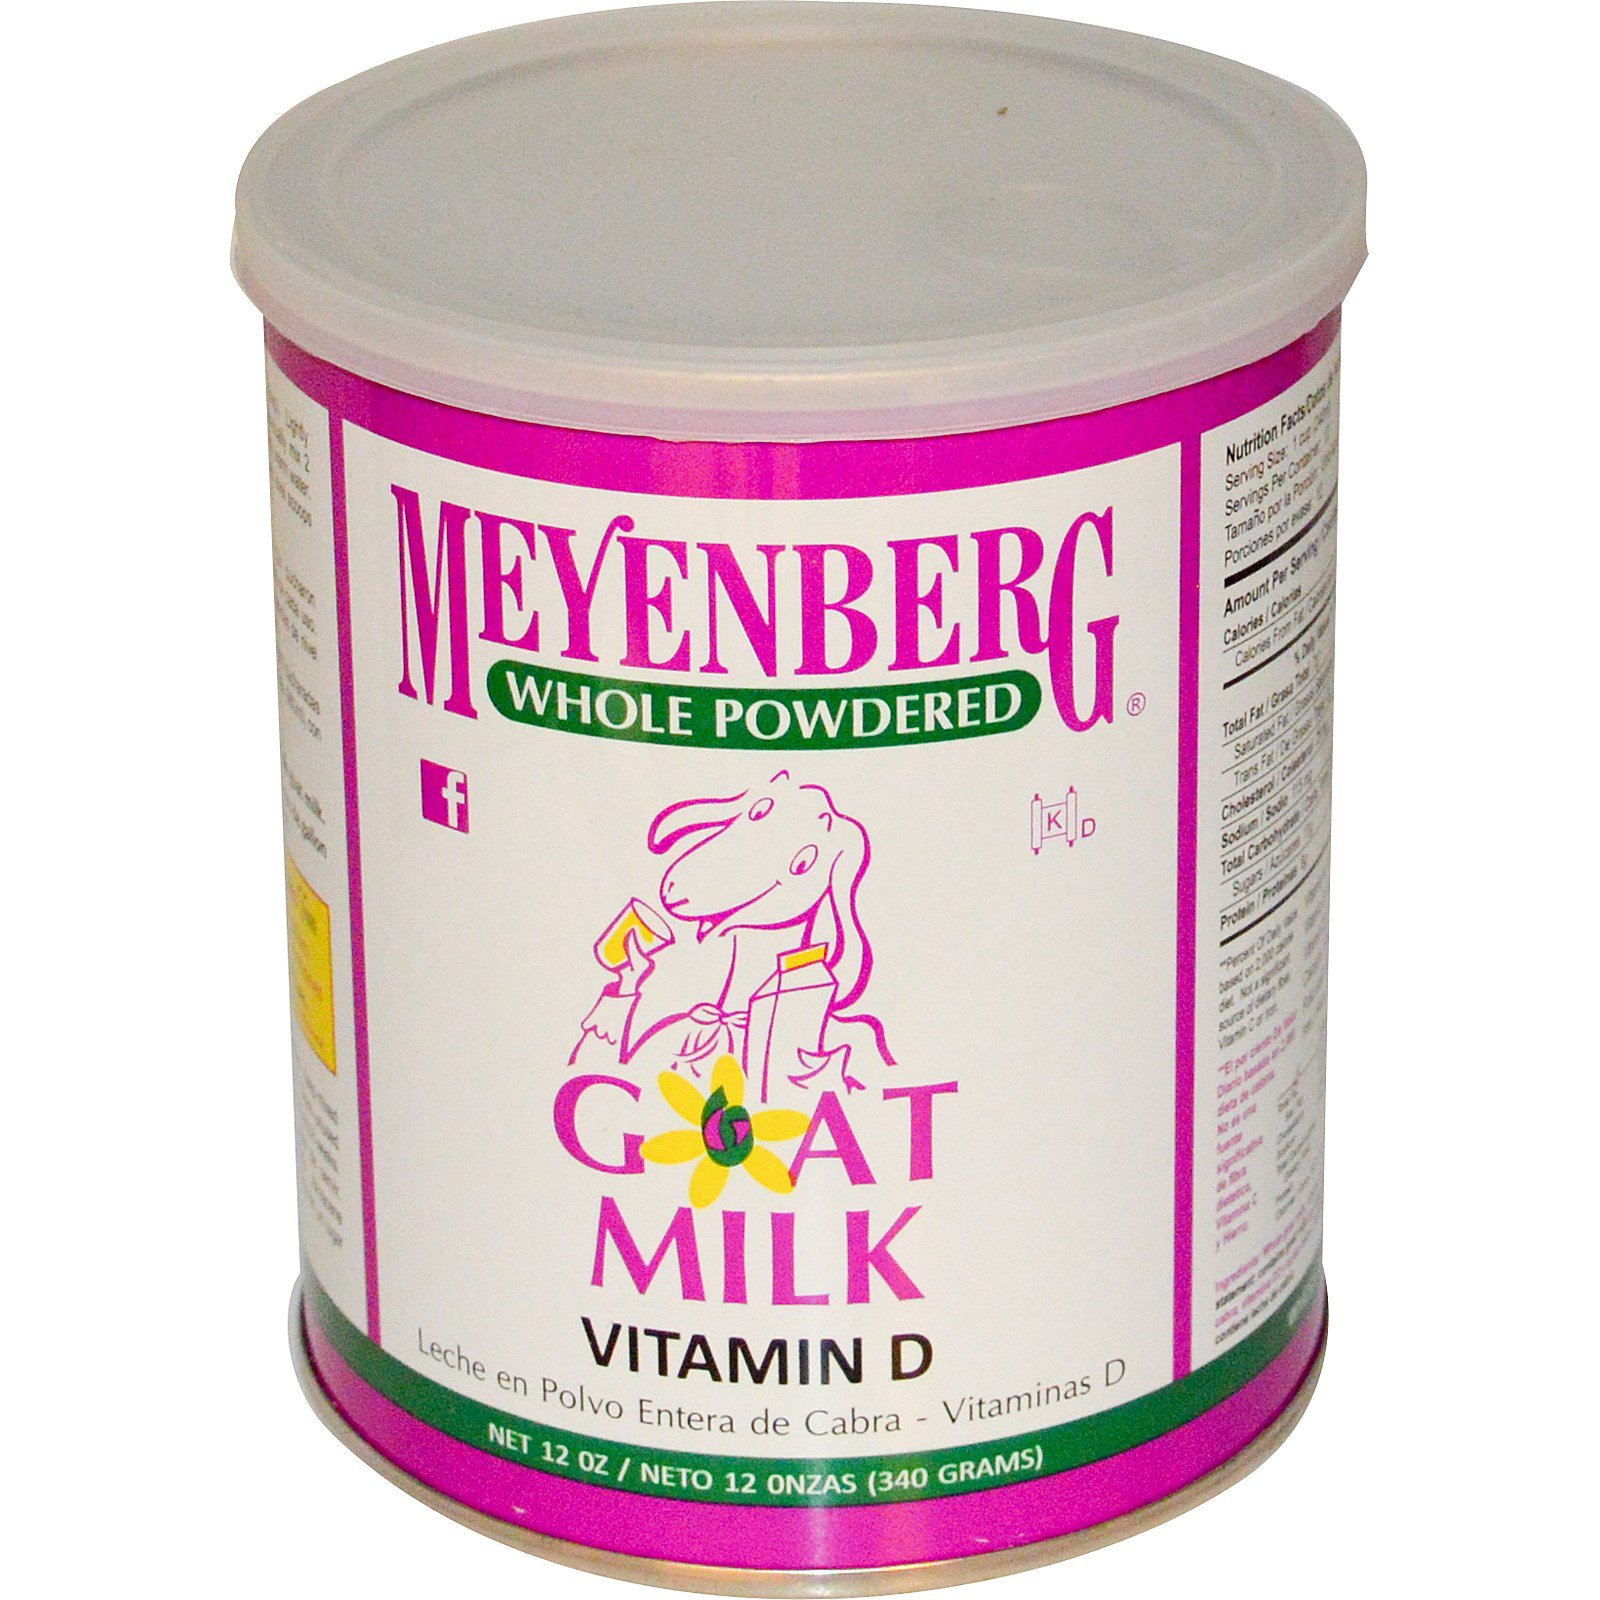 Meyenberg Goat Milk, Whole Powdered Goat Milk, Vitamin D ...